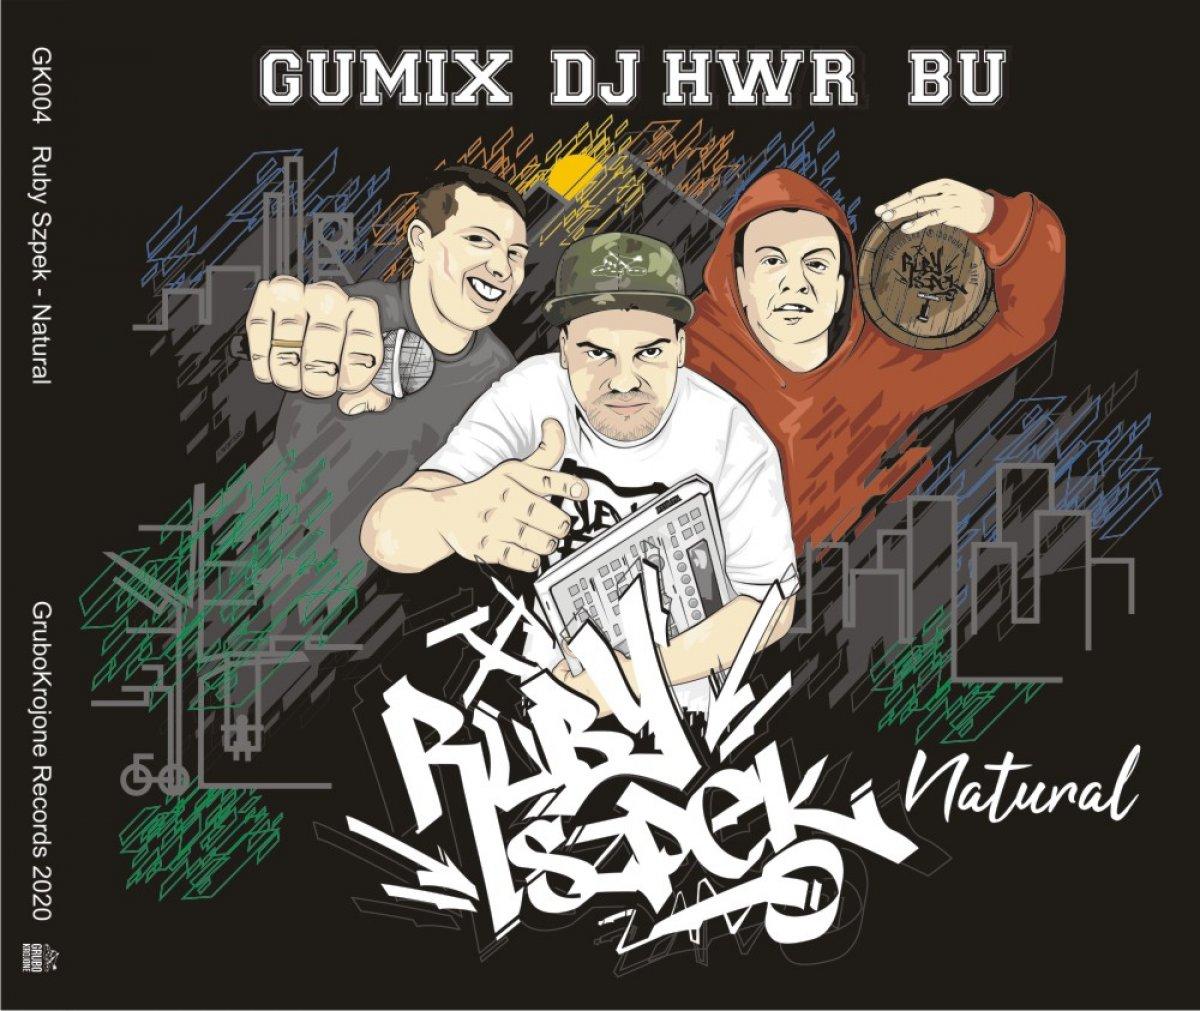 RUBY SZPEK (BU GUMIX DJ HWR) - NATURAL CD